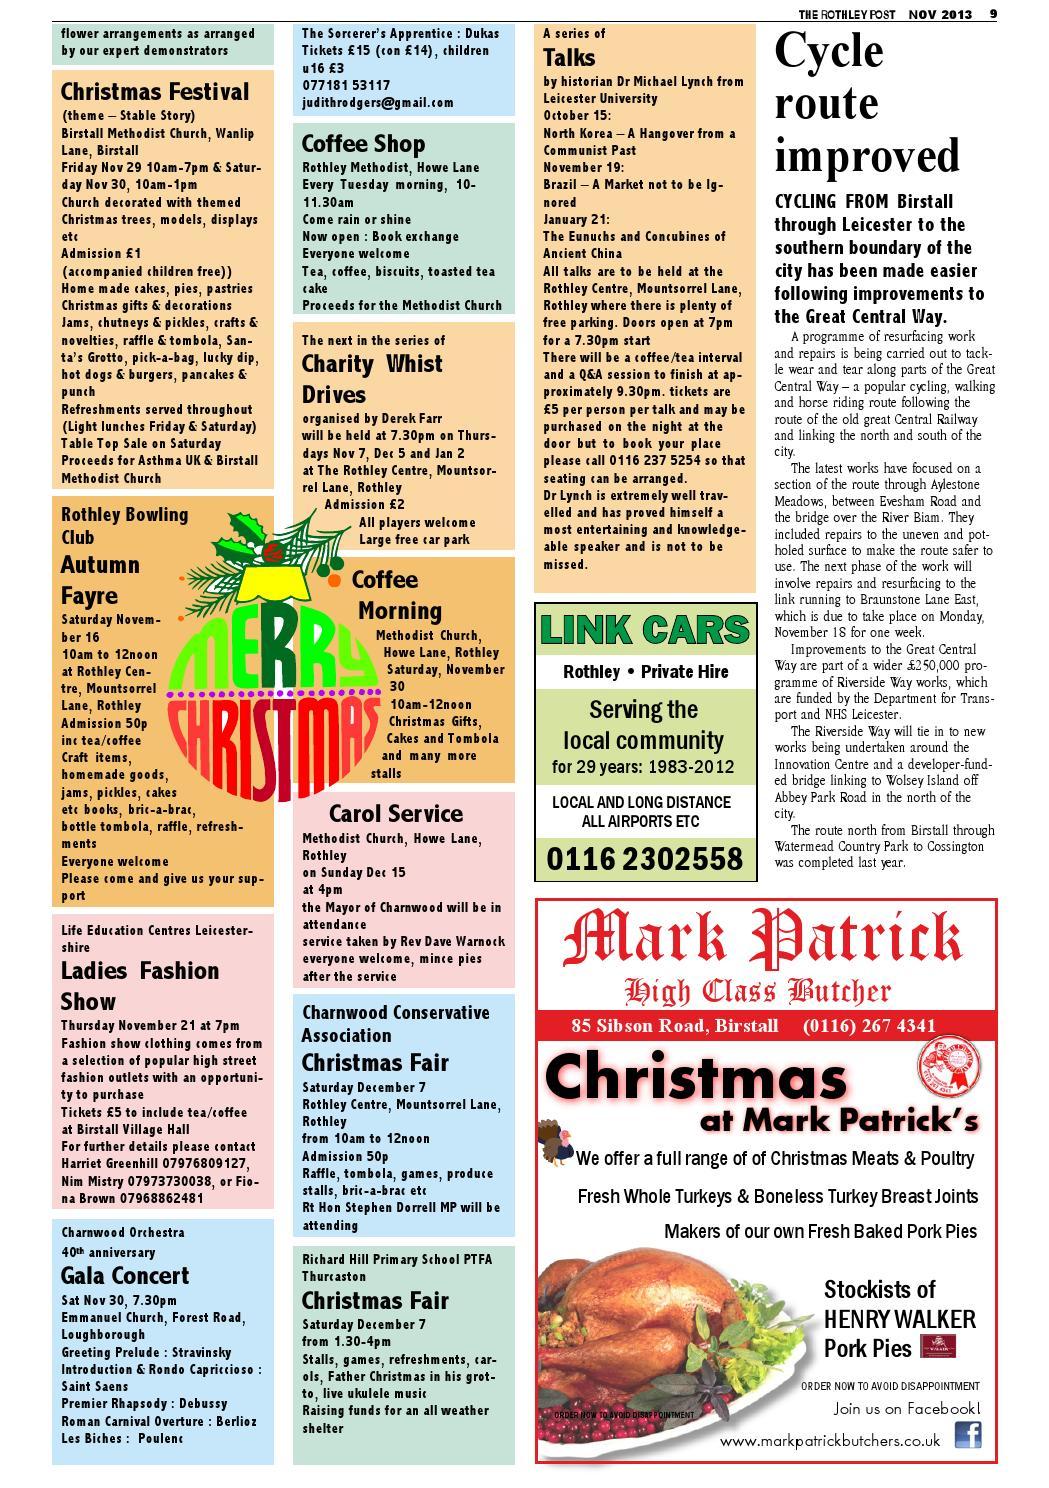 Rothley Post 103 Nov 2013 By The Birstall Post Issuu